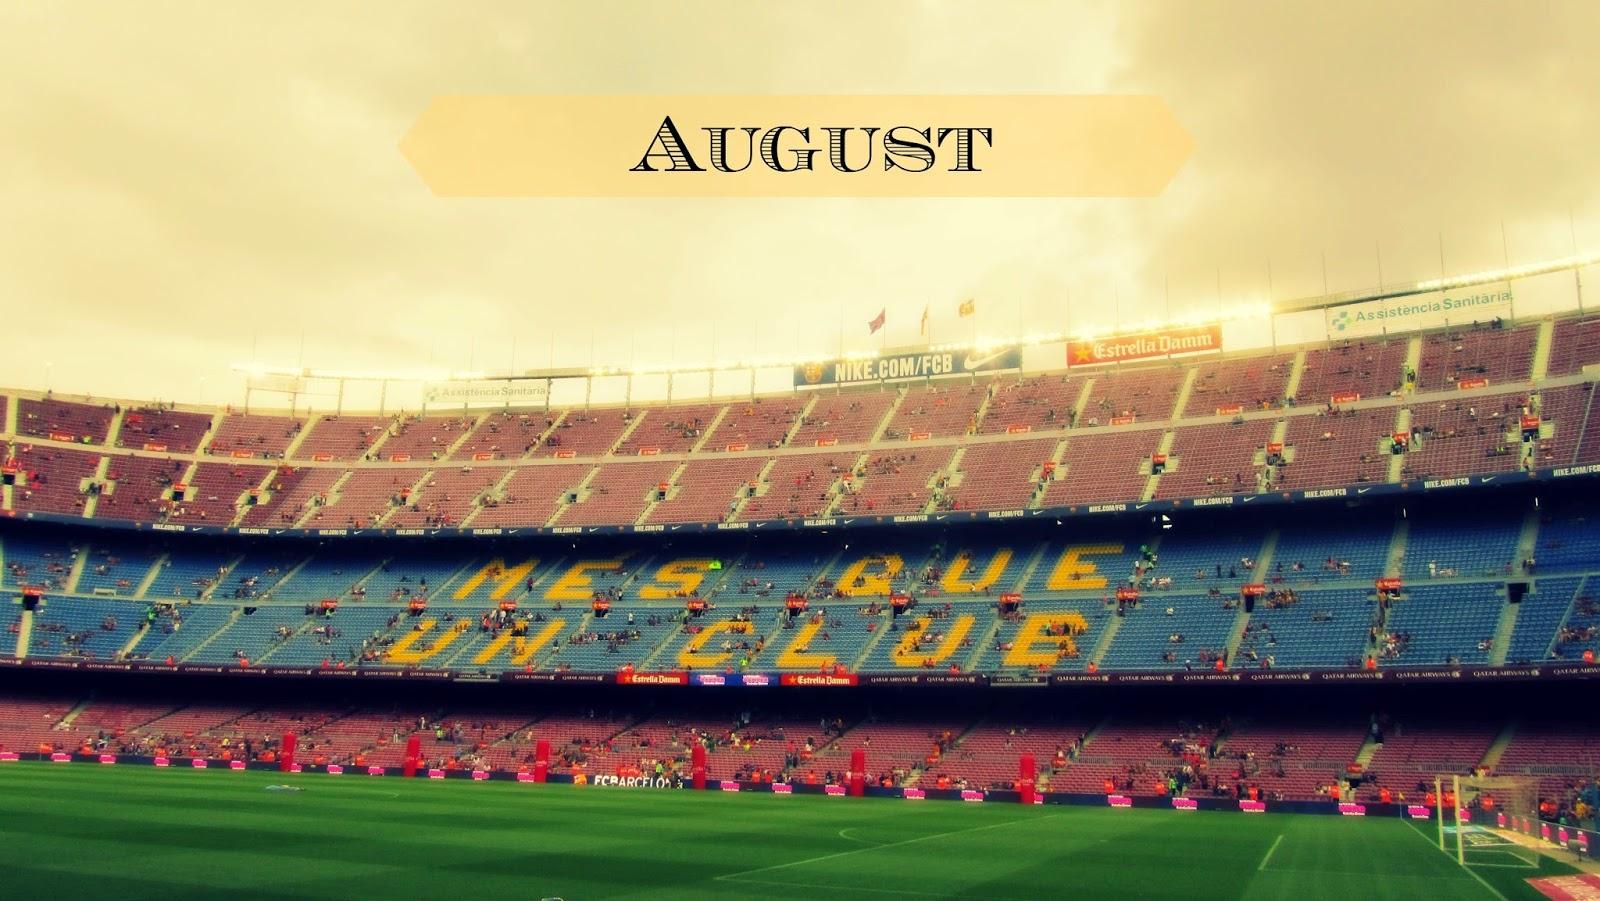 http://sussysmediterraneantreasures.blogspot.de/2014/08/freundschaftsspiel-fc-barcelona-vs-club.html